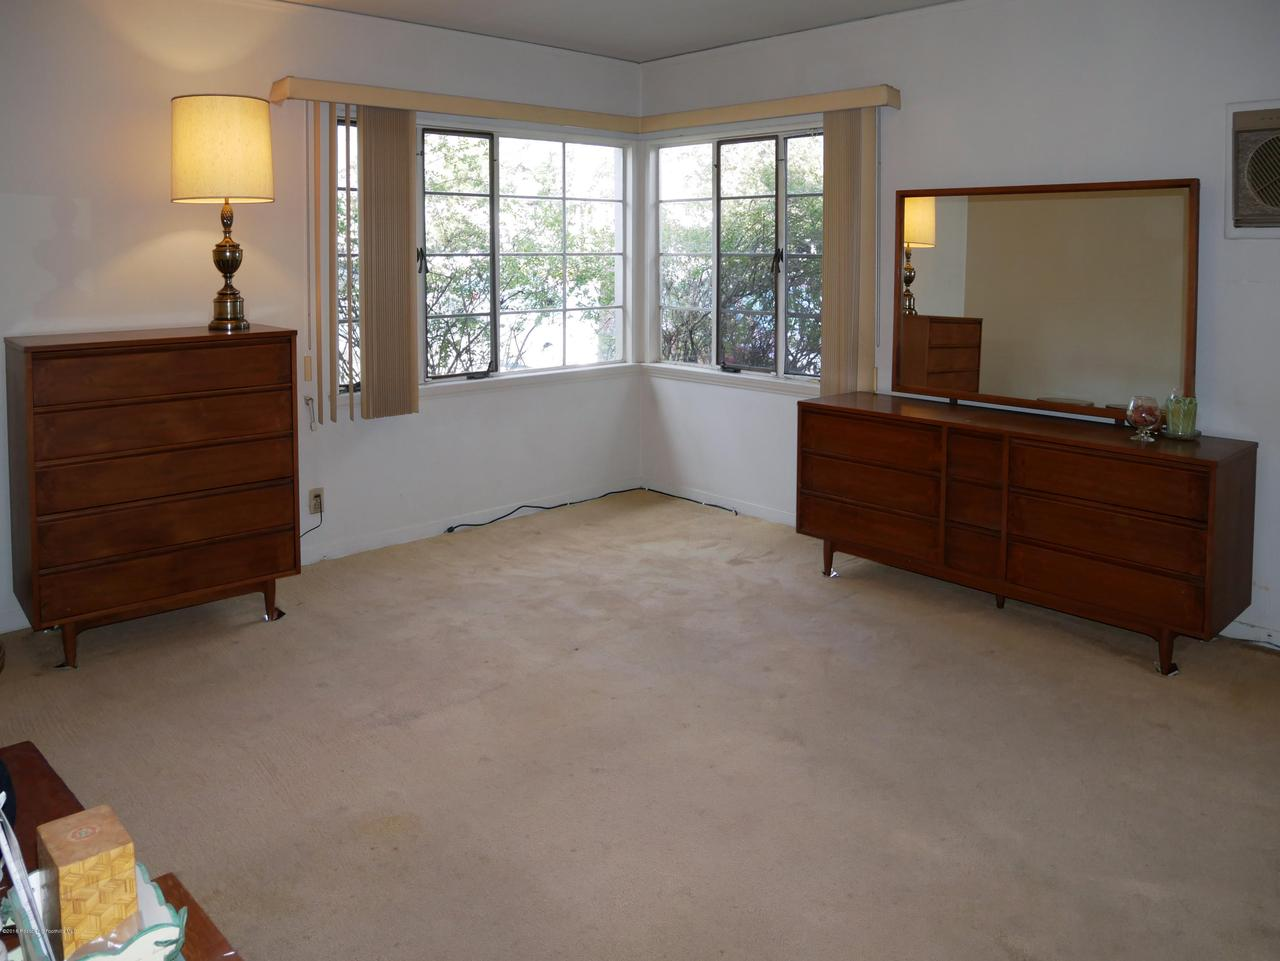 2432 ORANGE GROVE, Pasadena, CA 91104 - Master Bed 1